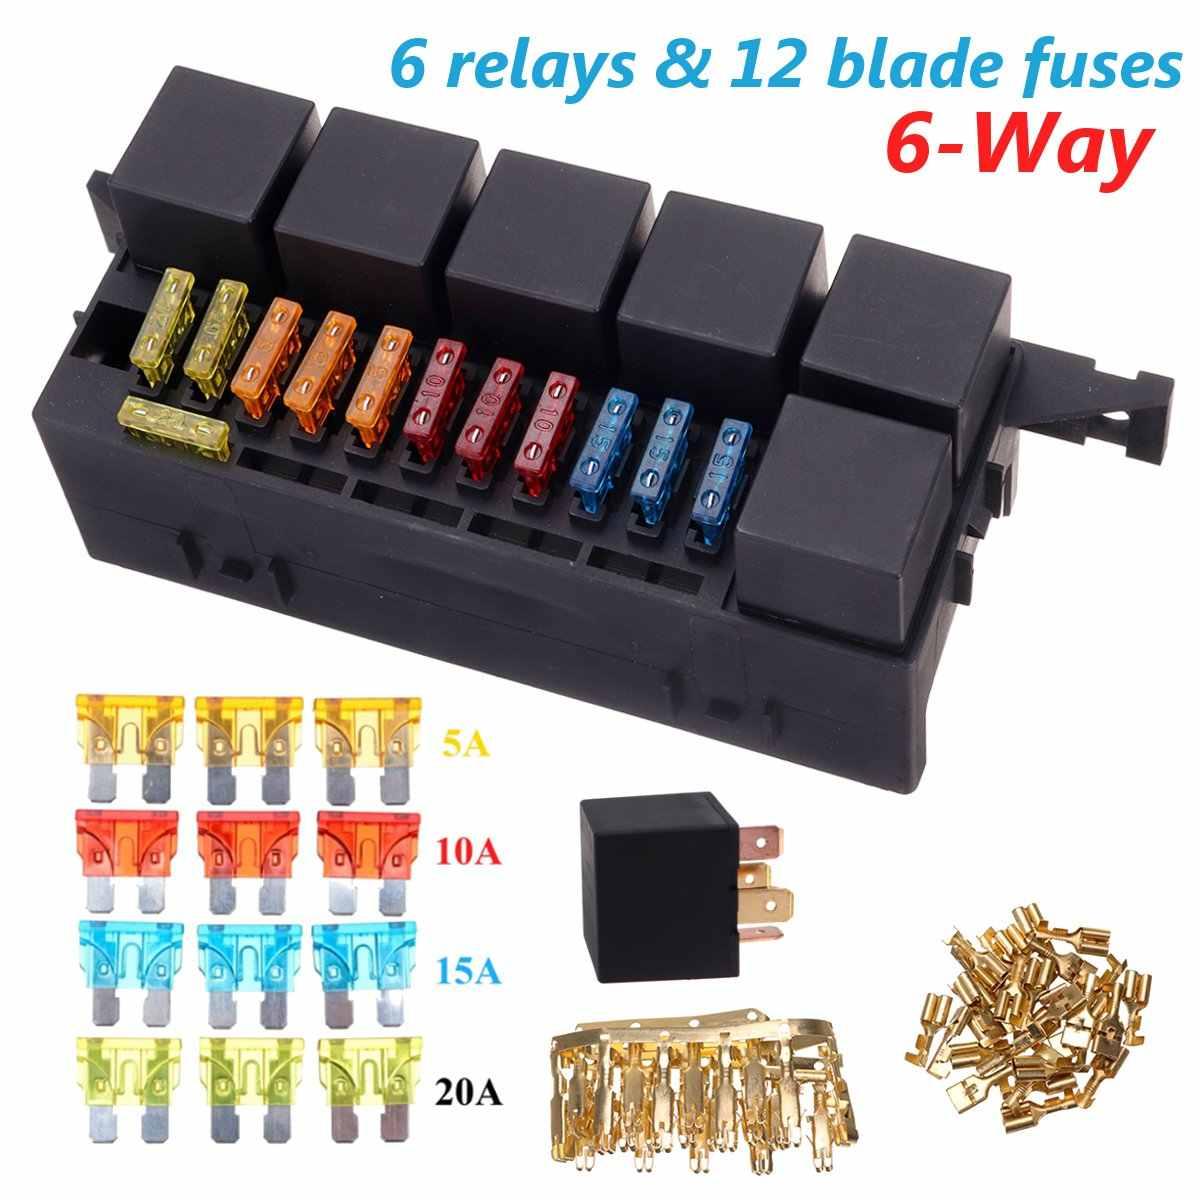 medium resolution of auto car part 6 way 6 relays w relay box 12 blade fuses waterproof